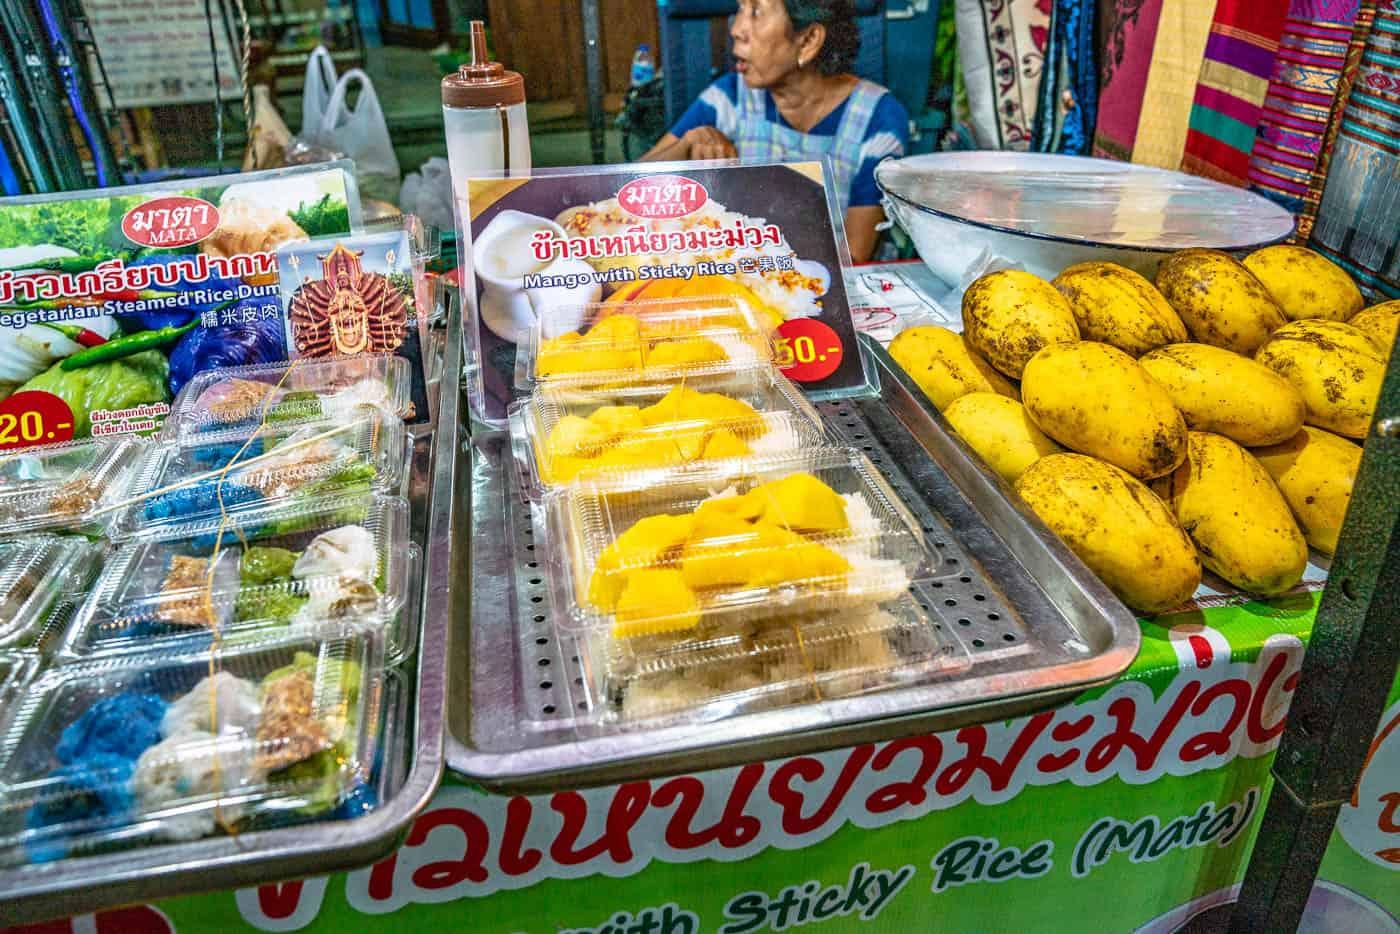 Saturday Walking Street mango with sticky rice